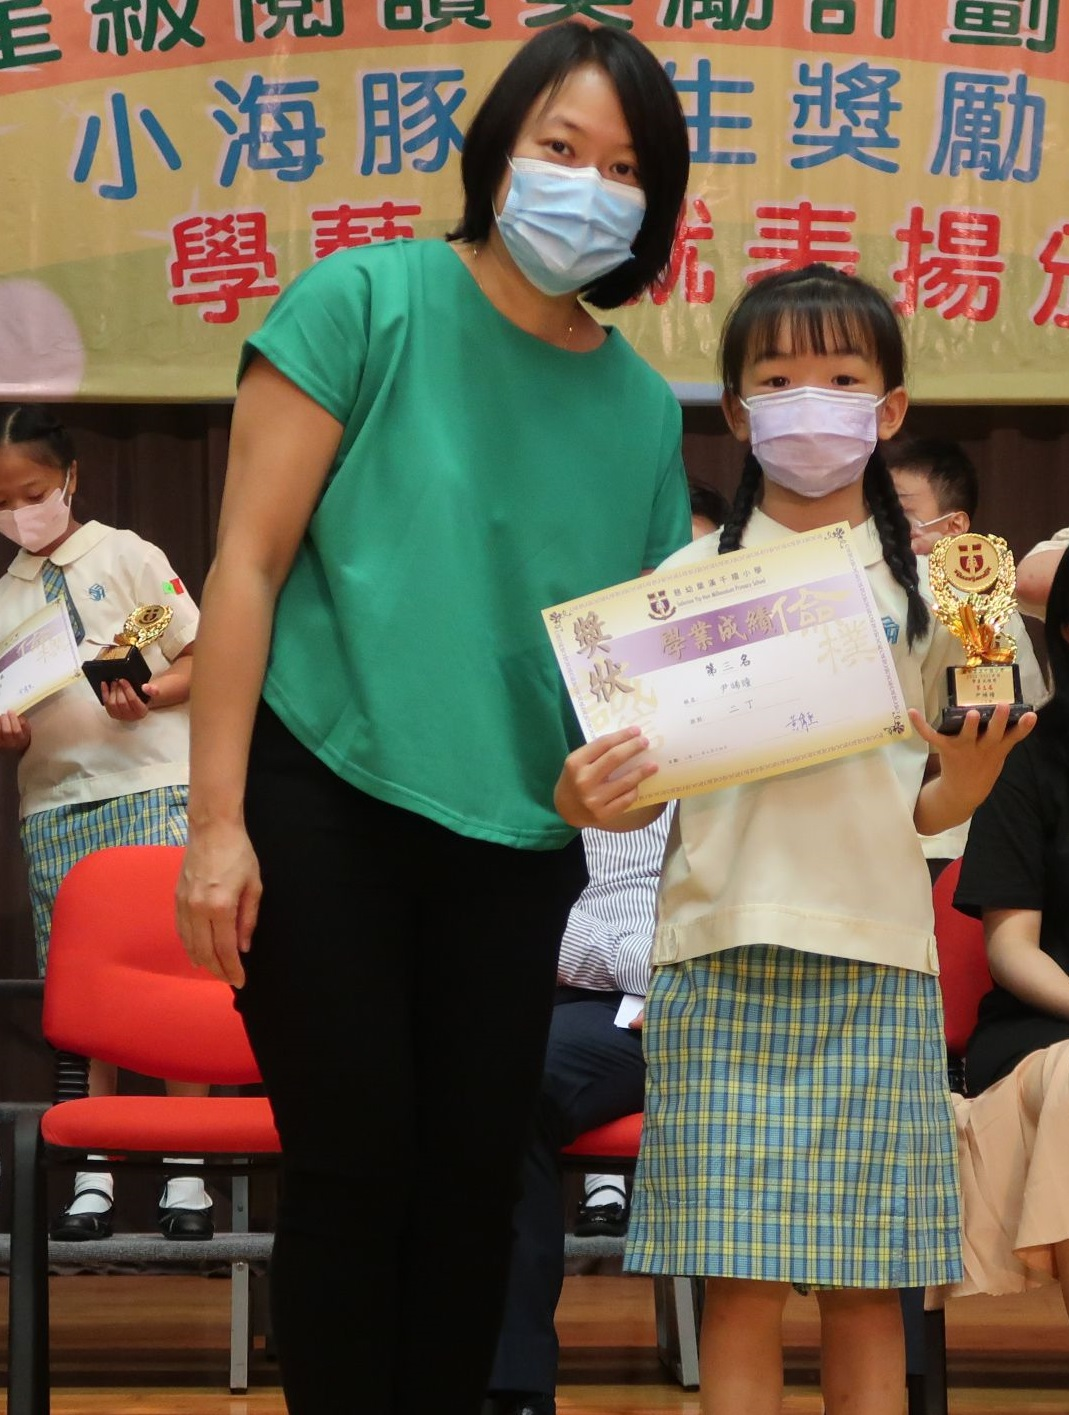 https://syh.edu.hk/sites/default/files/img_5418.jpg